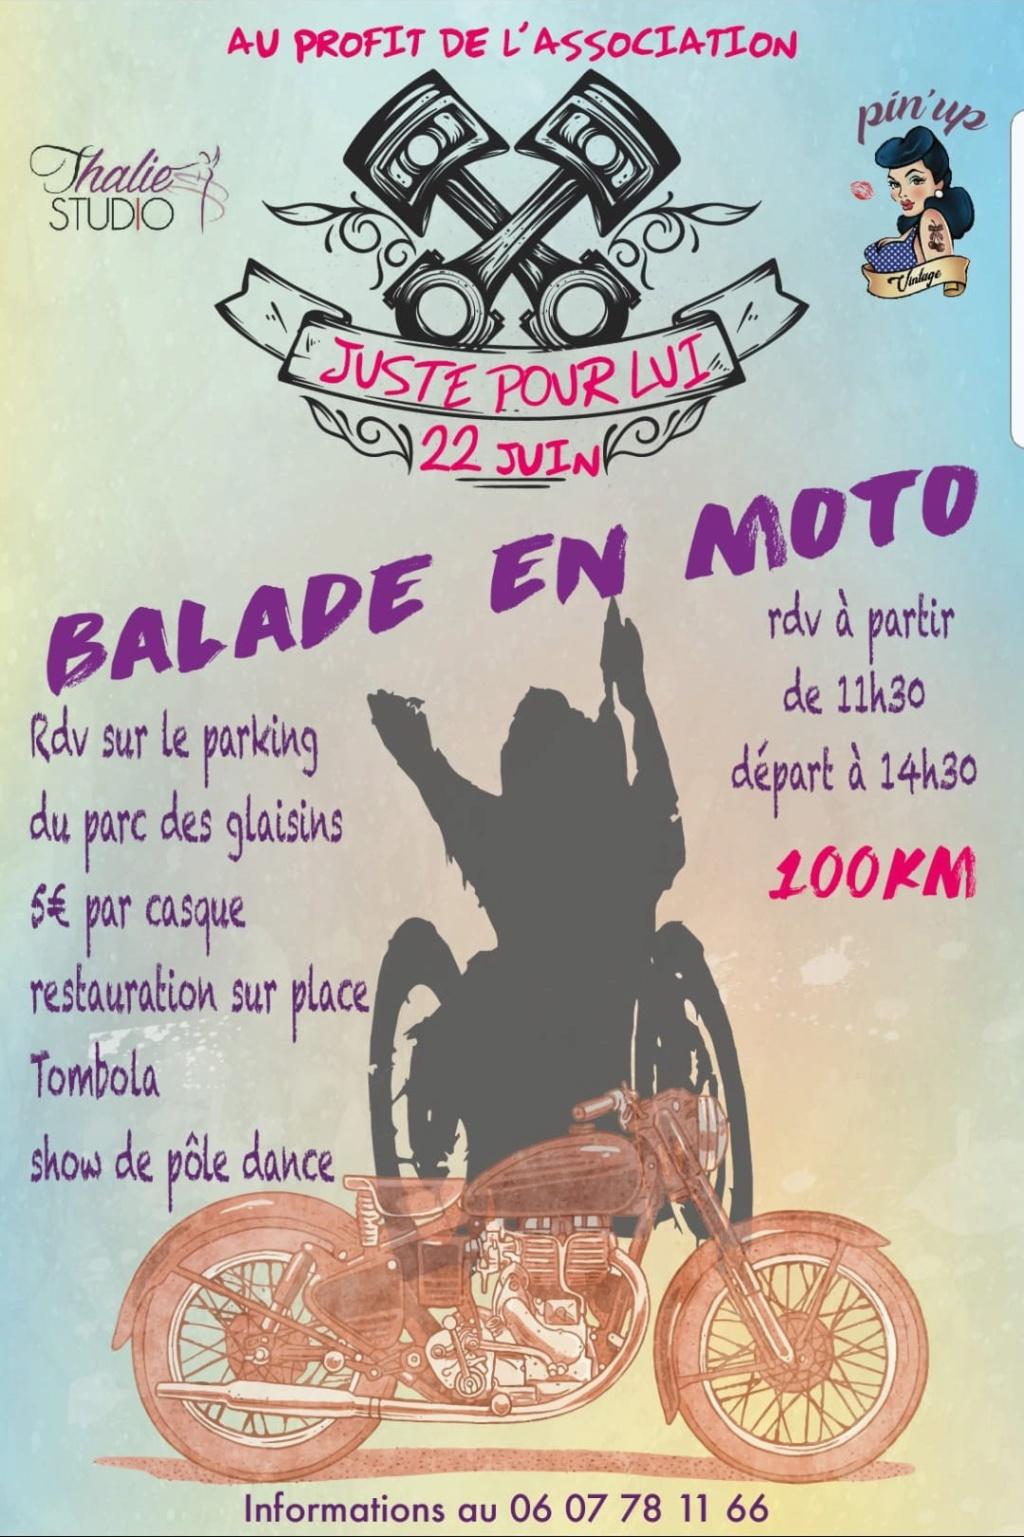 MANIFESTATION - Balade Moto - 22 Juin 2019 - Annecy-le Vieux (74) 5cf6a610